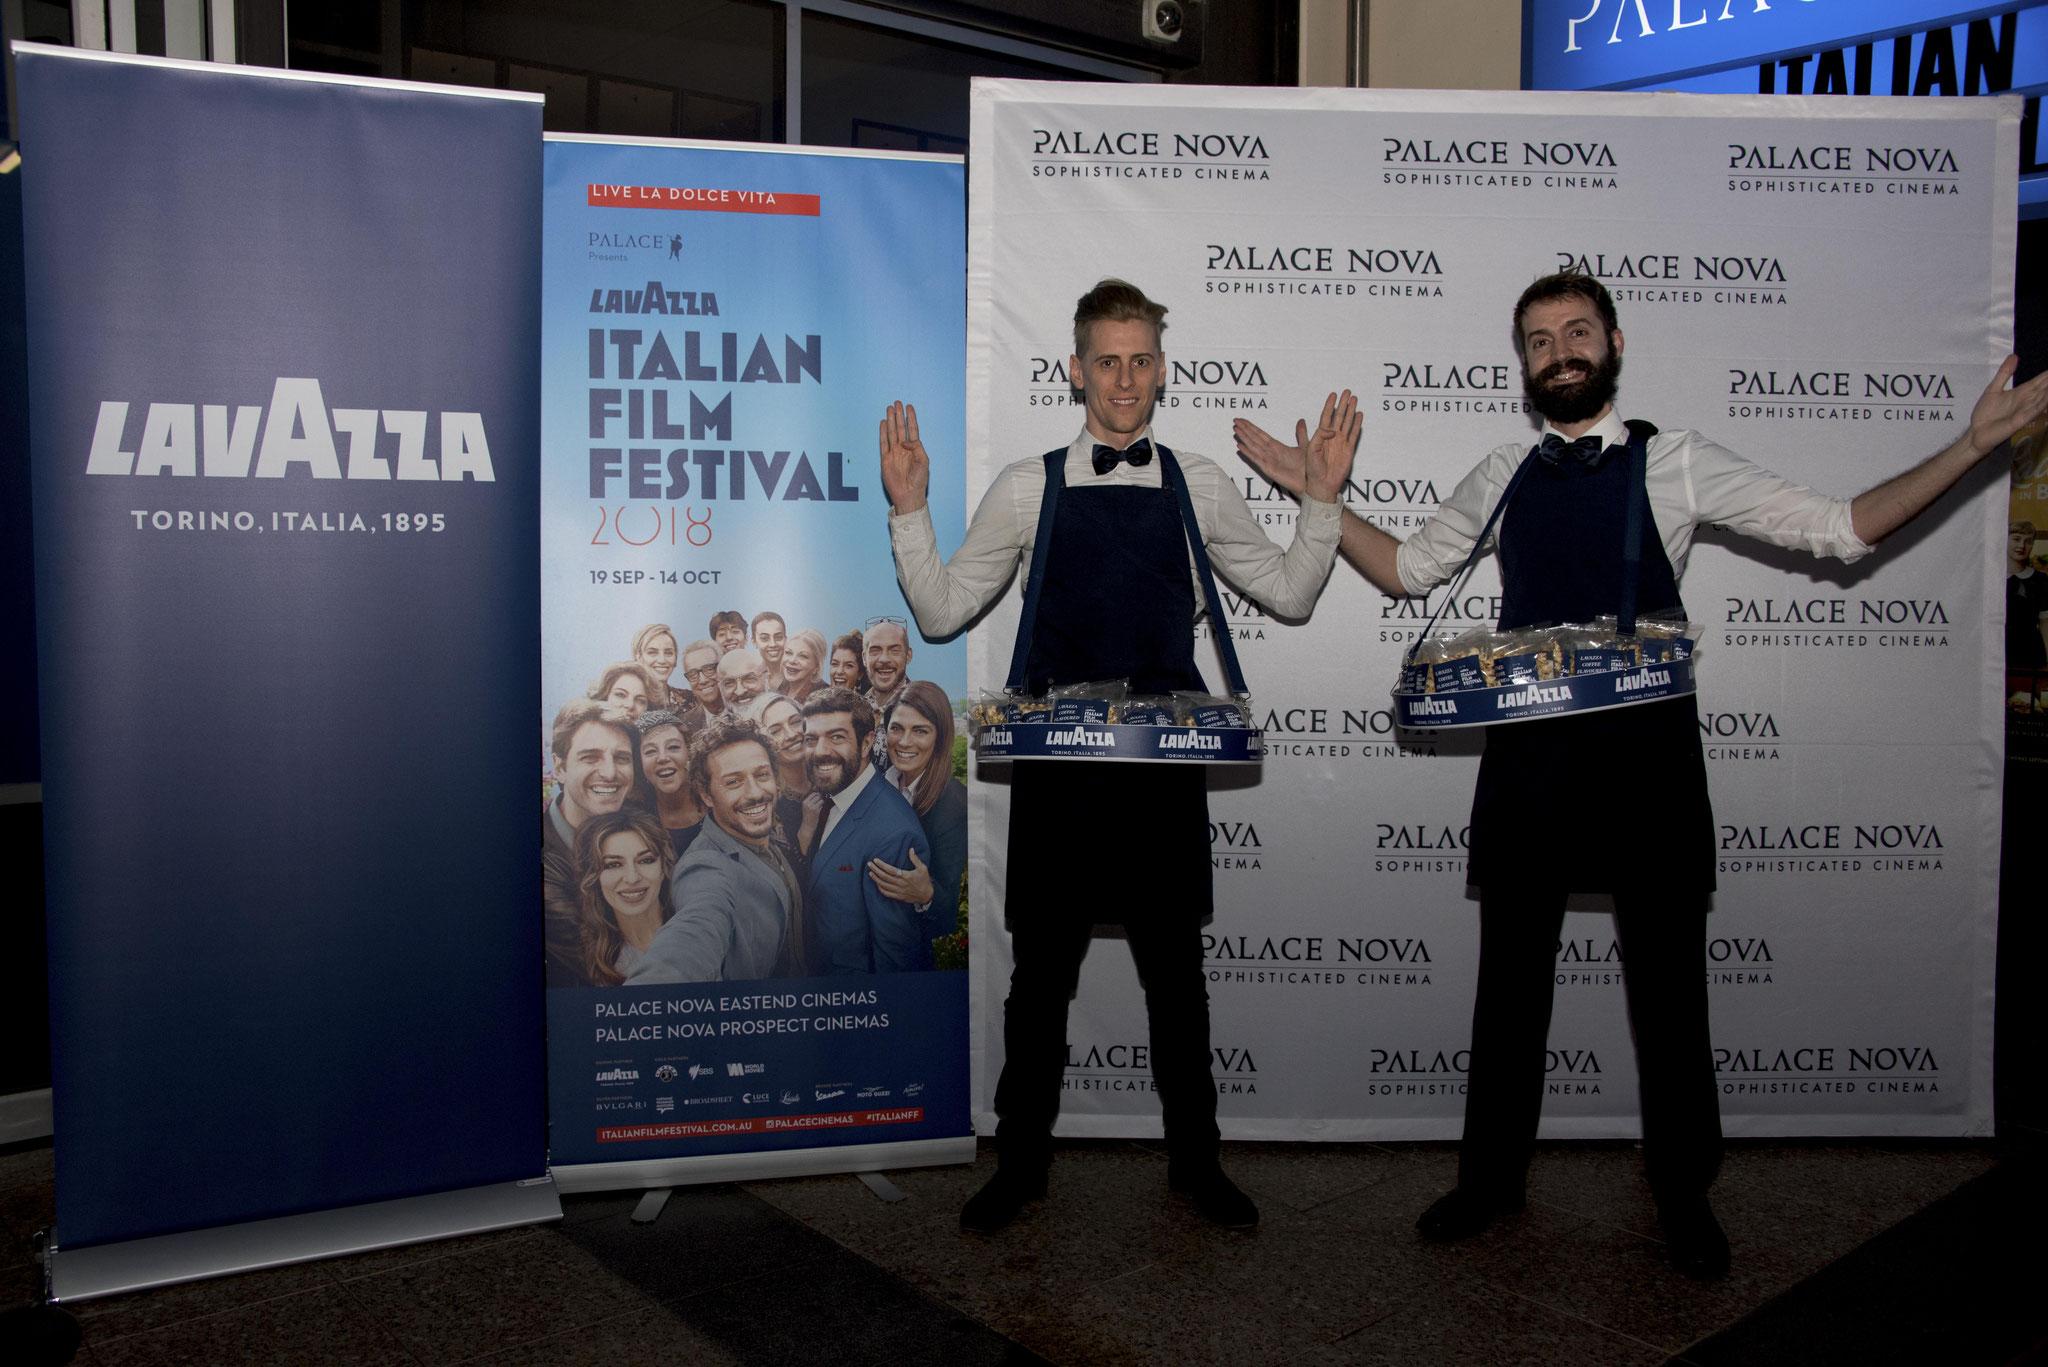 2018 Lavazza ItalianFilm Festival Opening Night